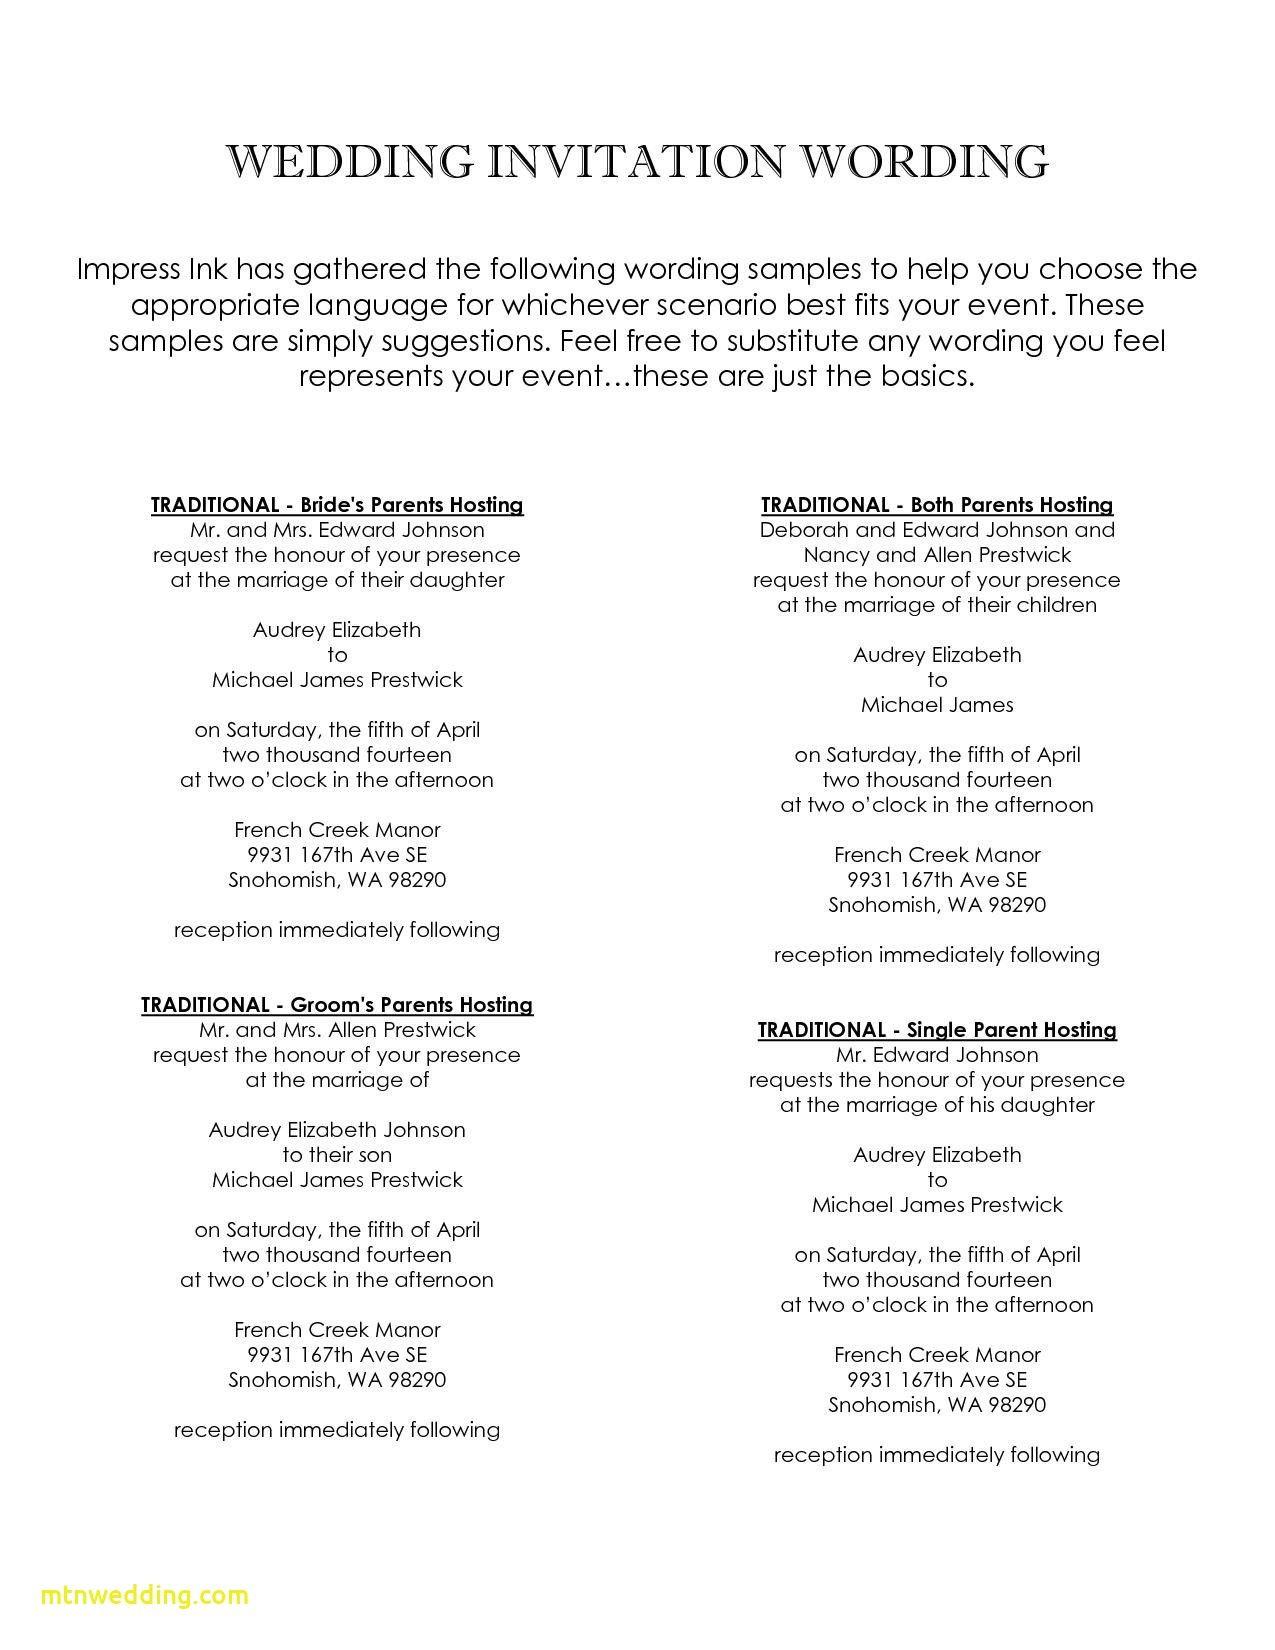 Inspiring Wedding Invitation Reply Wording Samples